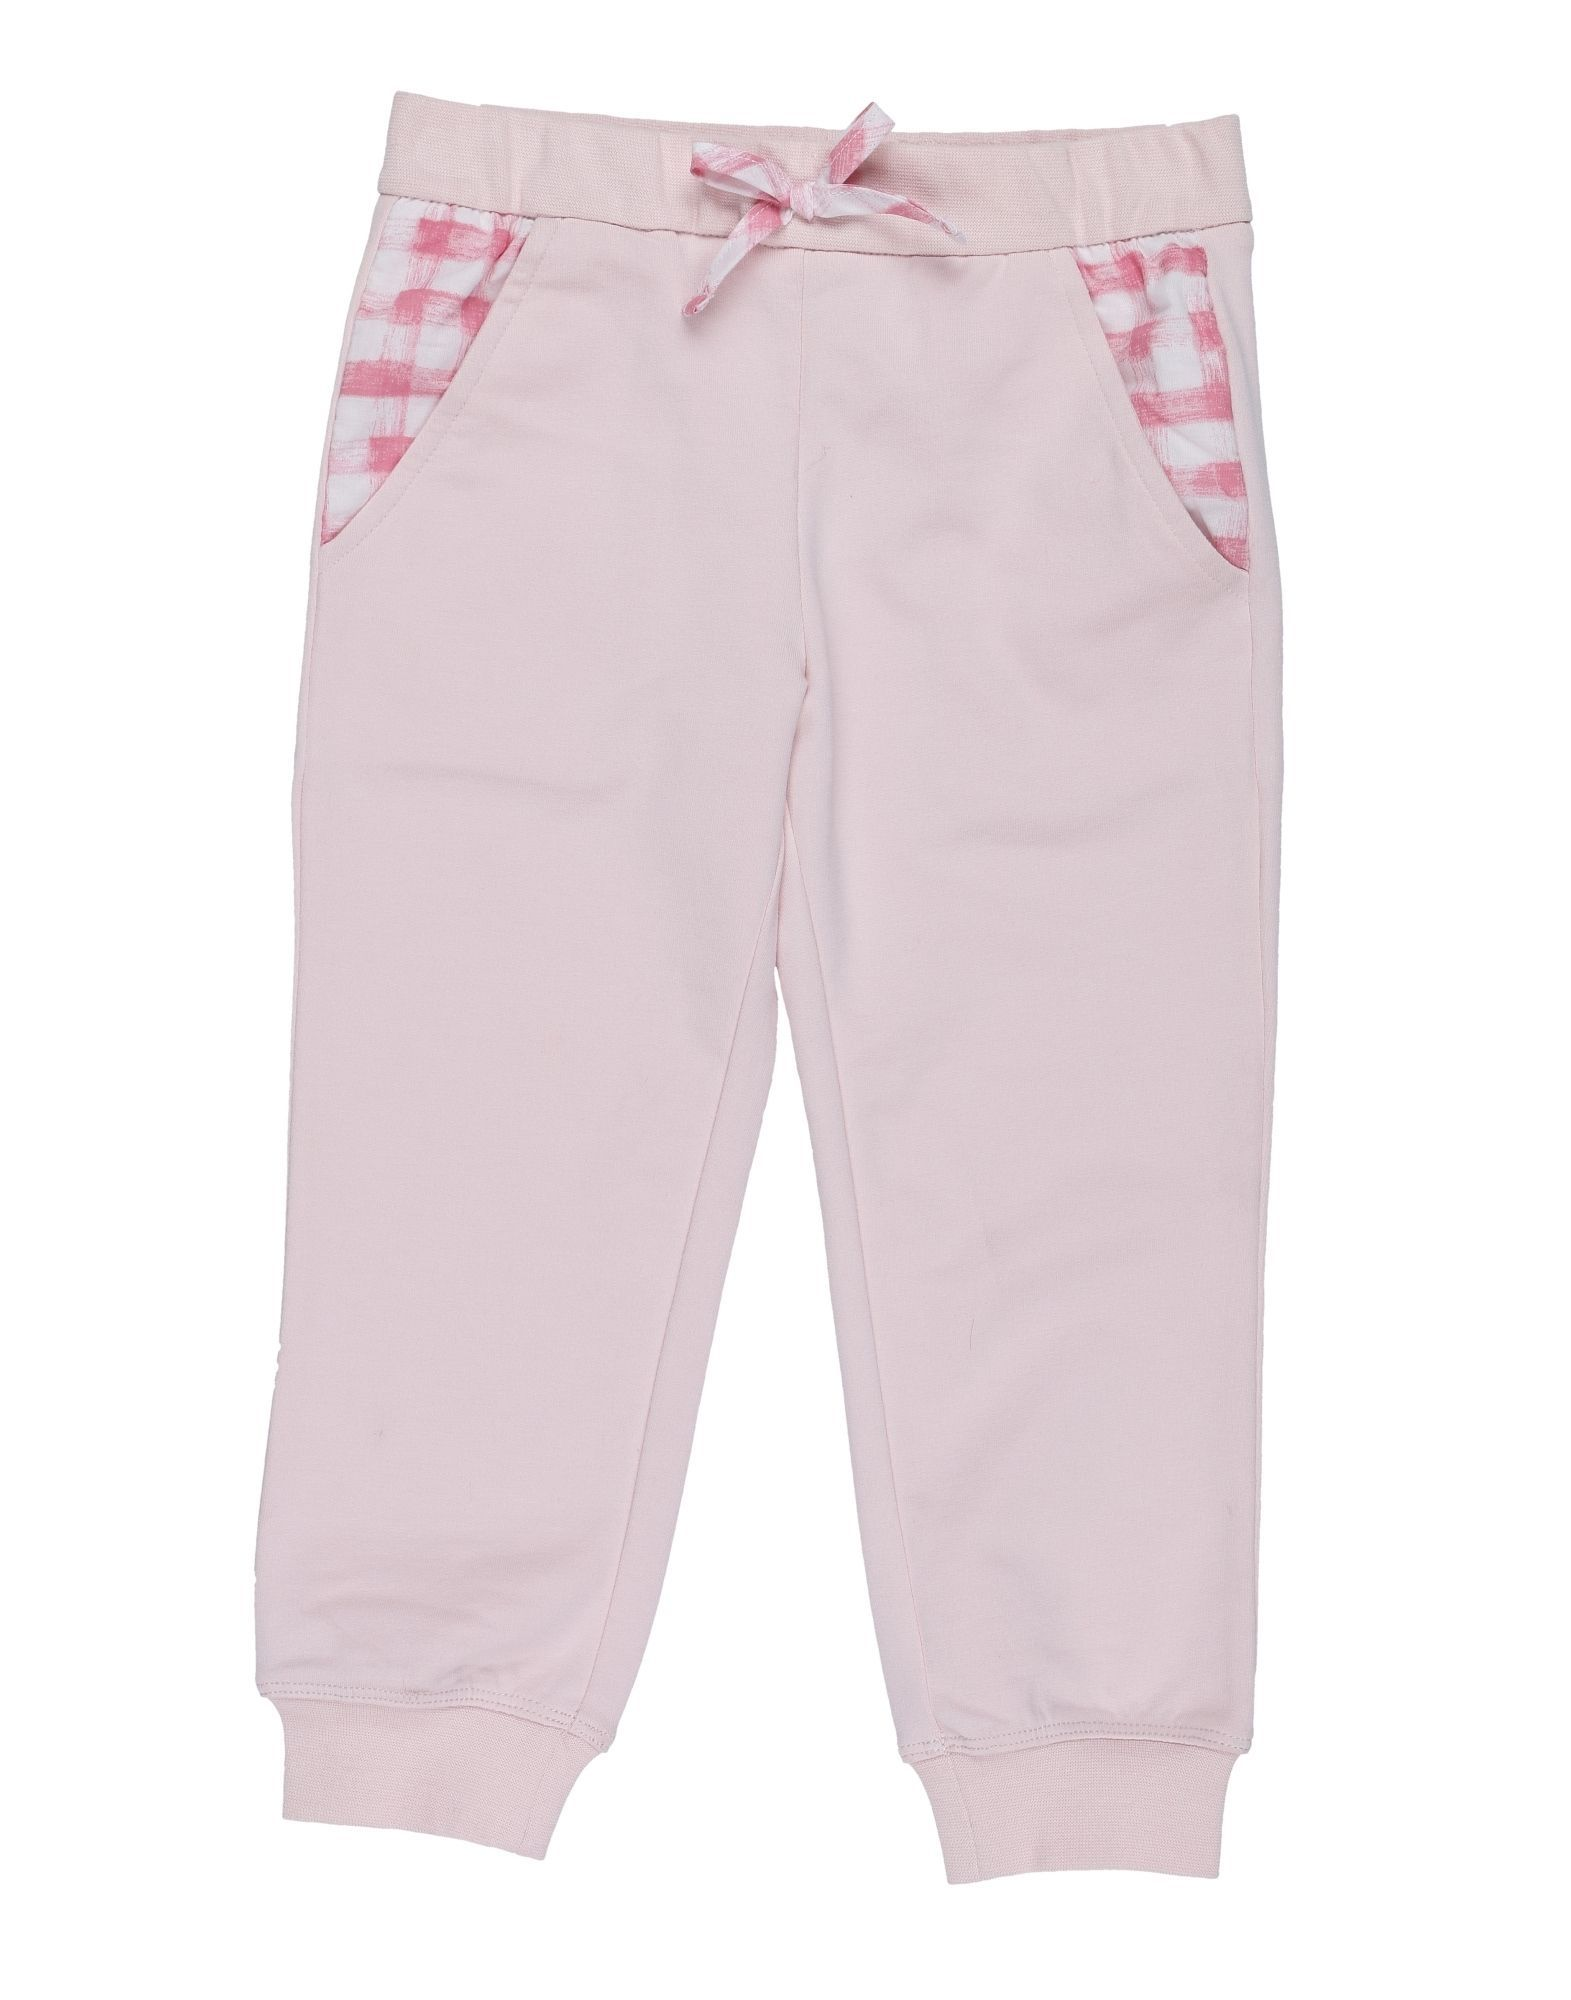 TROUSERS Armani Junior Pink Boy Cotton